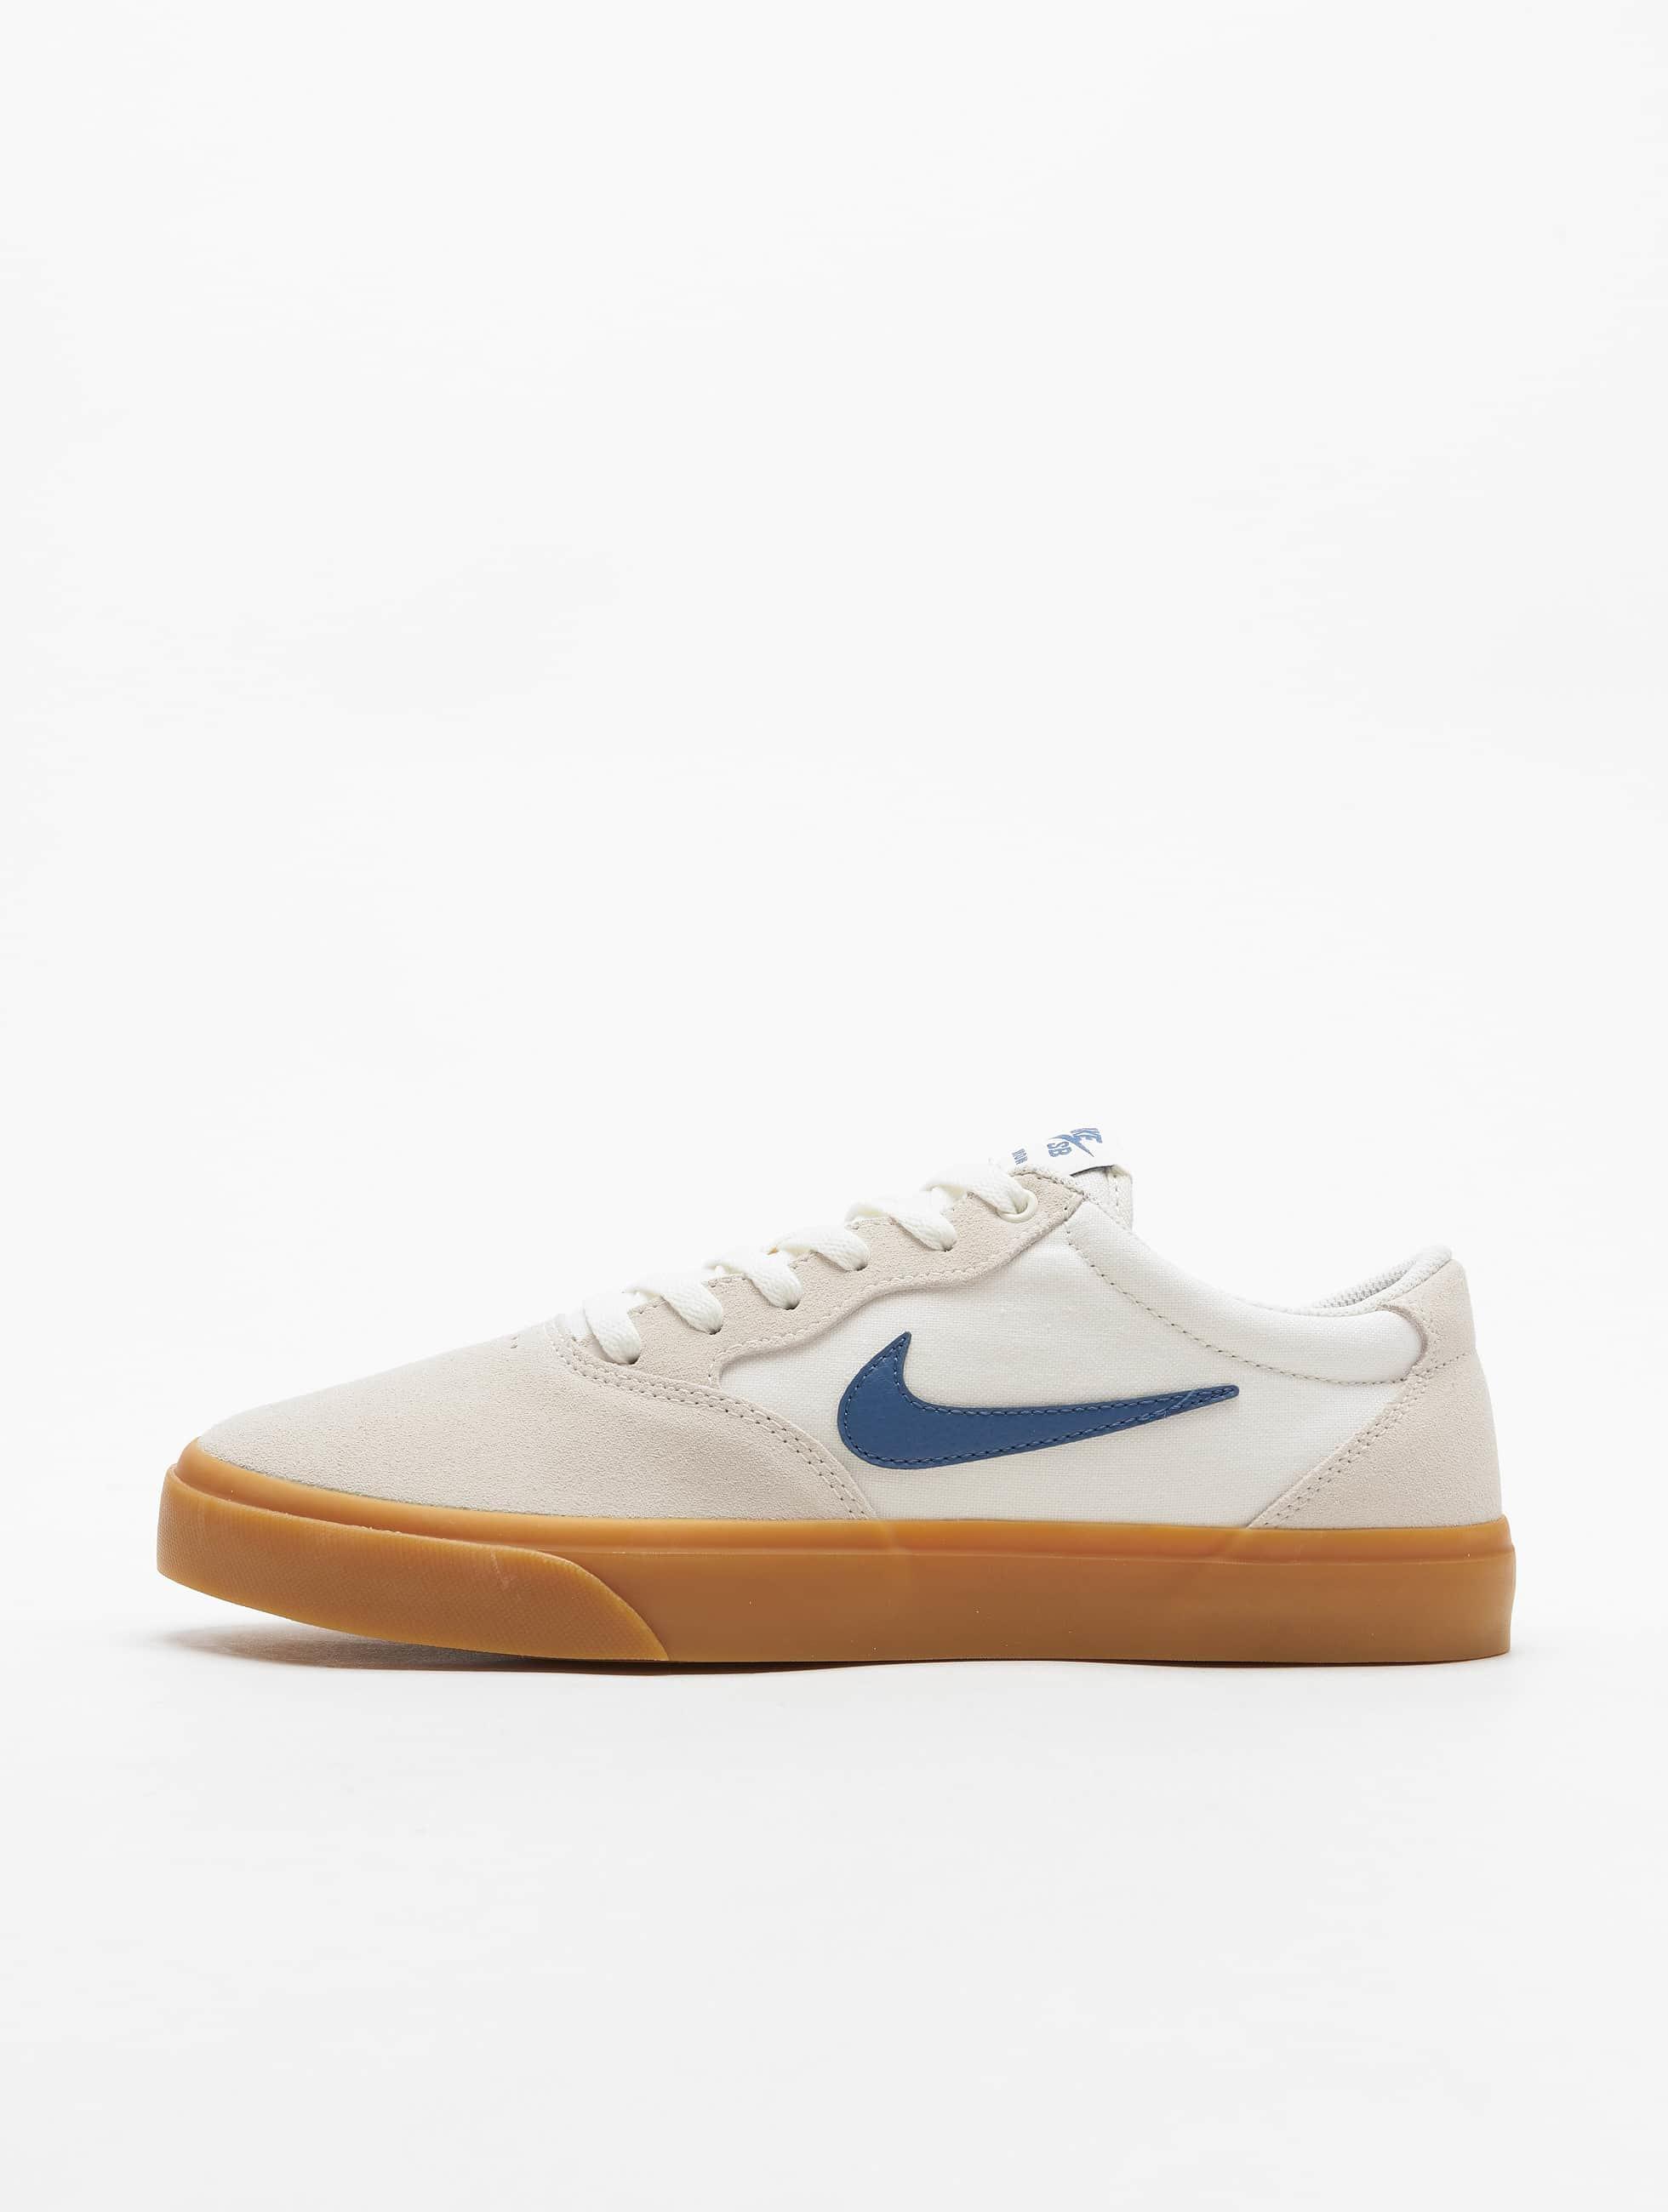 Nike SB Chron SLR Sneakers SailMystic NavySailGum Light Brown